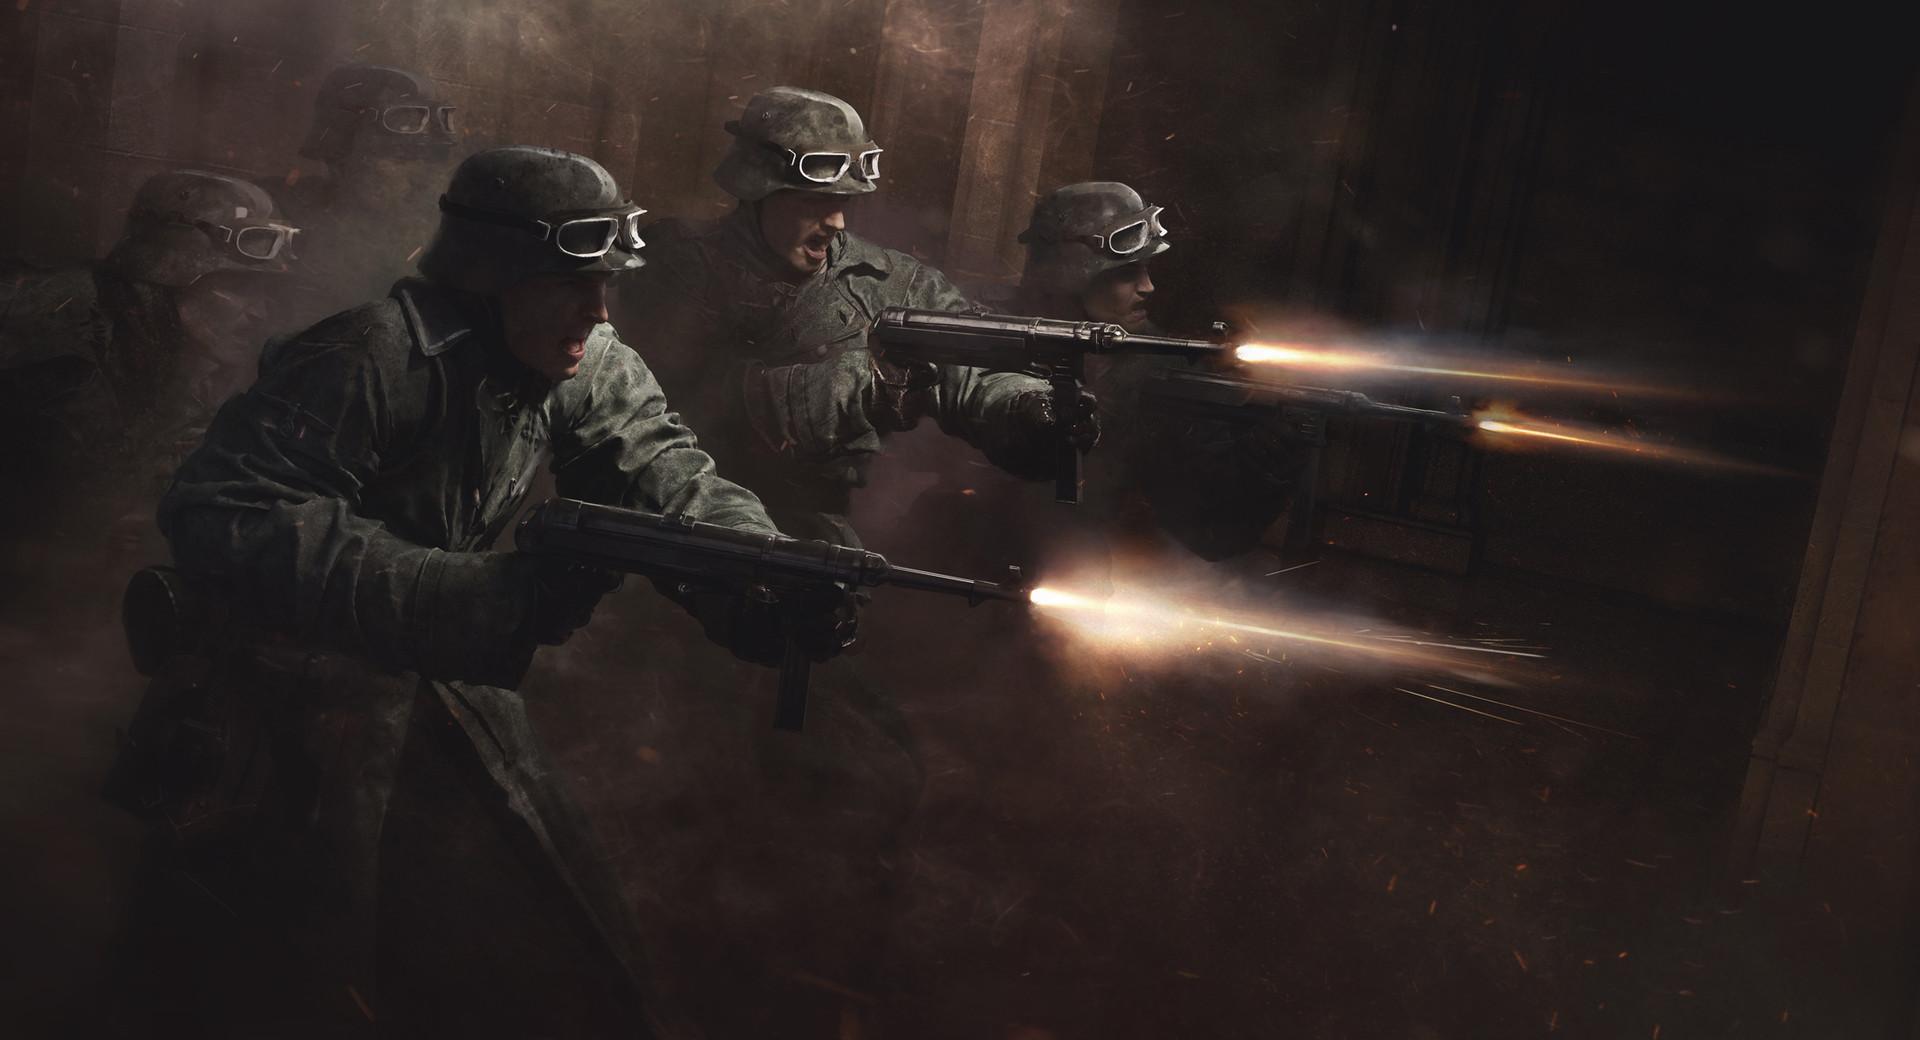 Guillem h pongiluppi 6 nazi soldiers